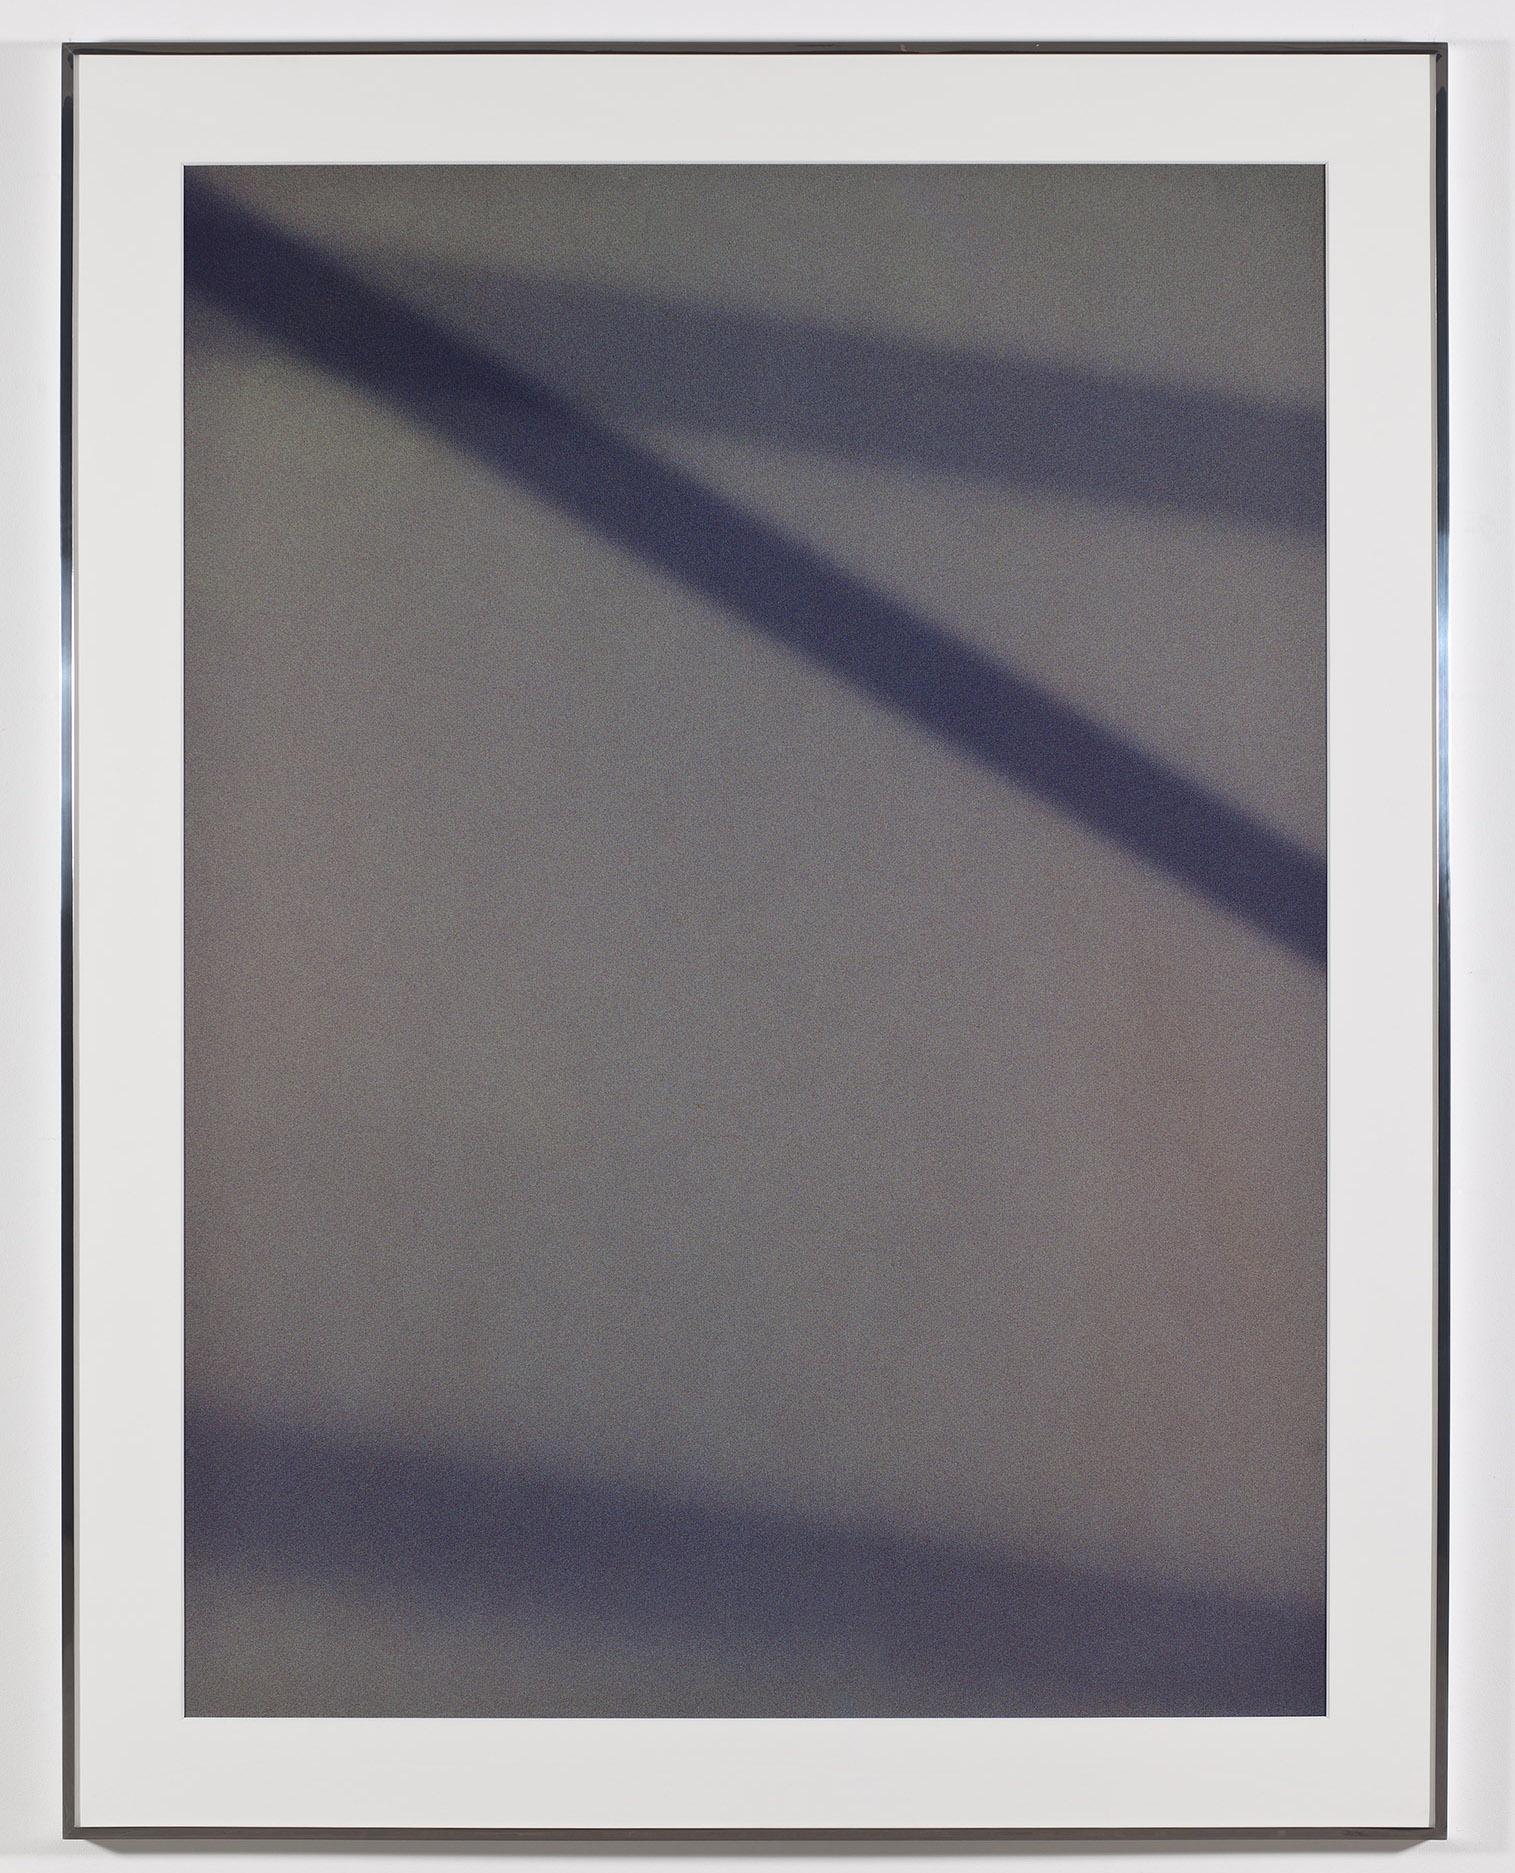 Transparency (Positive) [Fujichrome RDPIII Provia 100F Em. No. 05481: November 28–30, 2010 LAX/MIA MIA/LAX]    2011   Epson Ultrachrome K3 archival ink jet print on Museo Silver Rag Paper  68 x 52 1/4 inches   Transparencies, 2008–2014